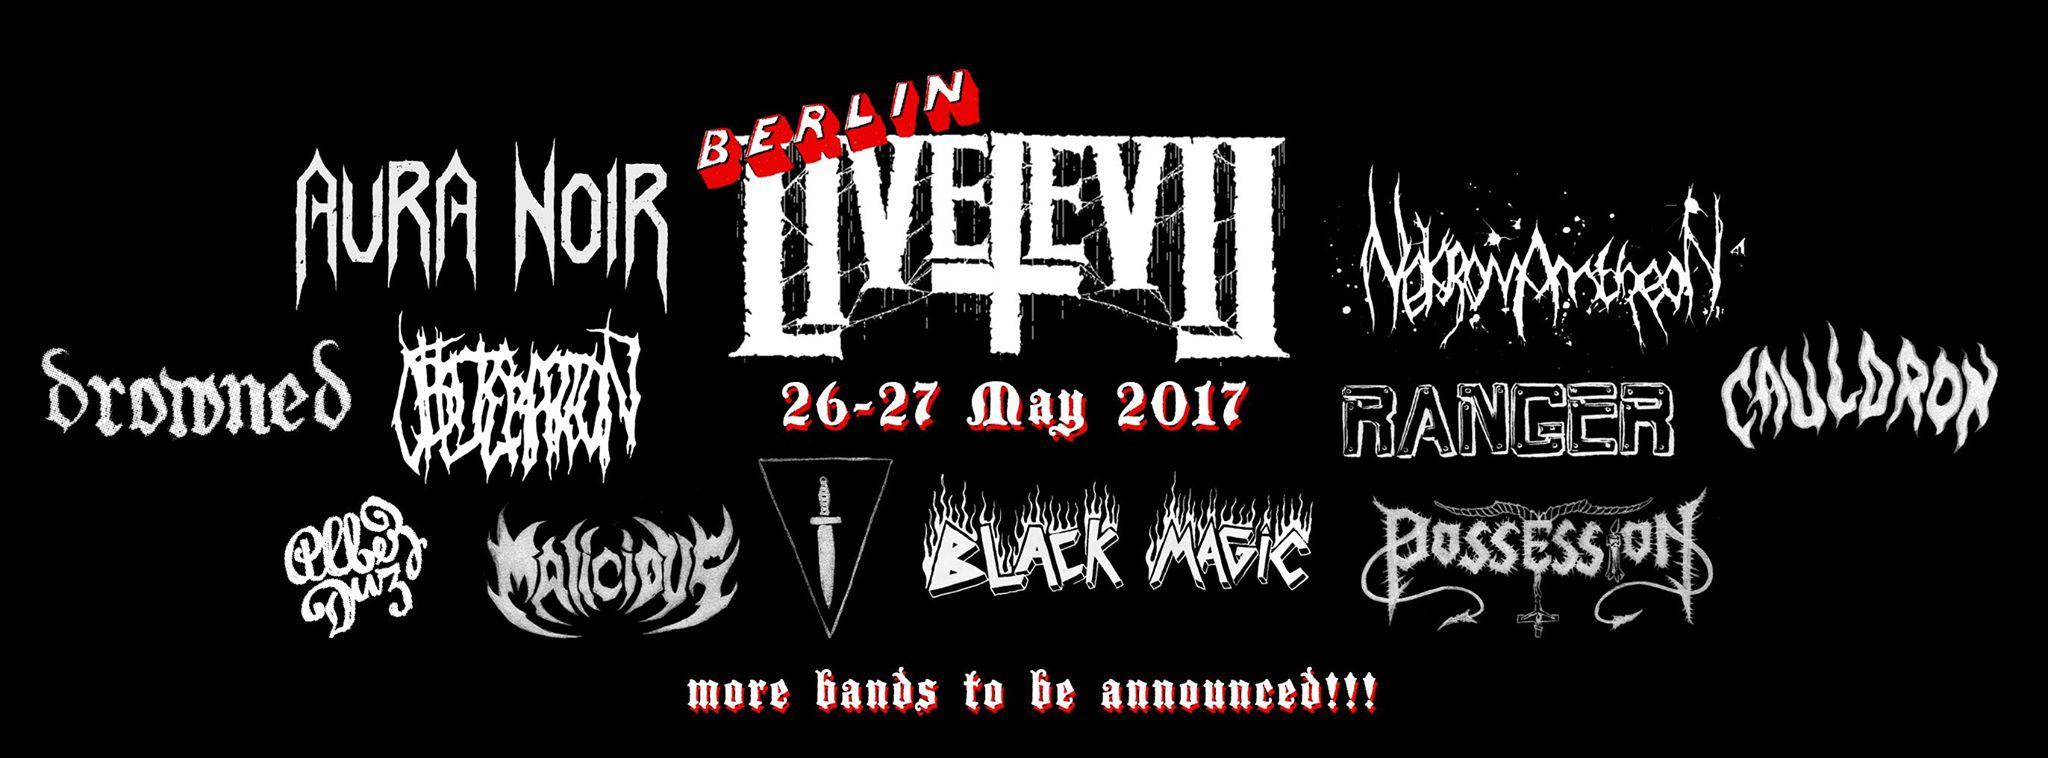 Live Evil Berlin